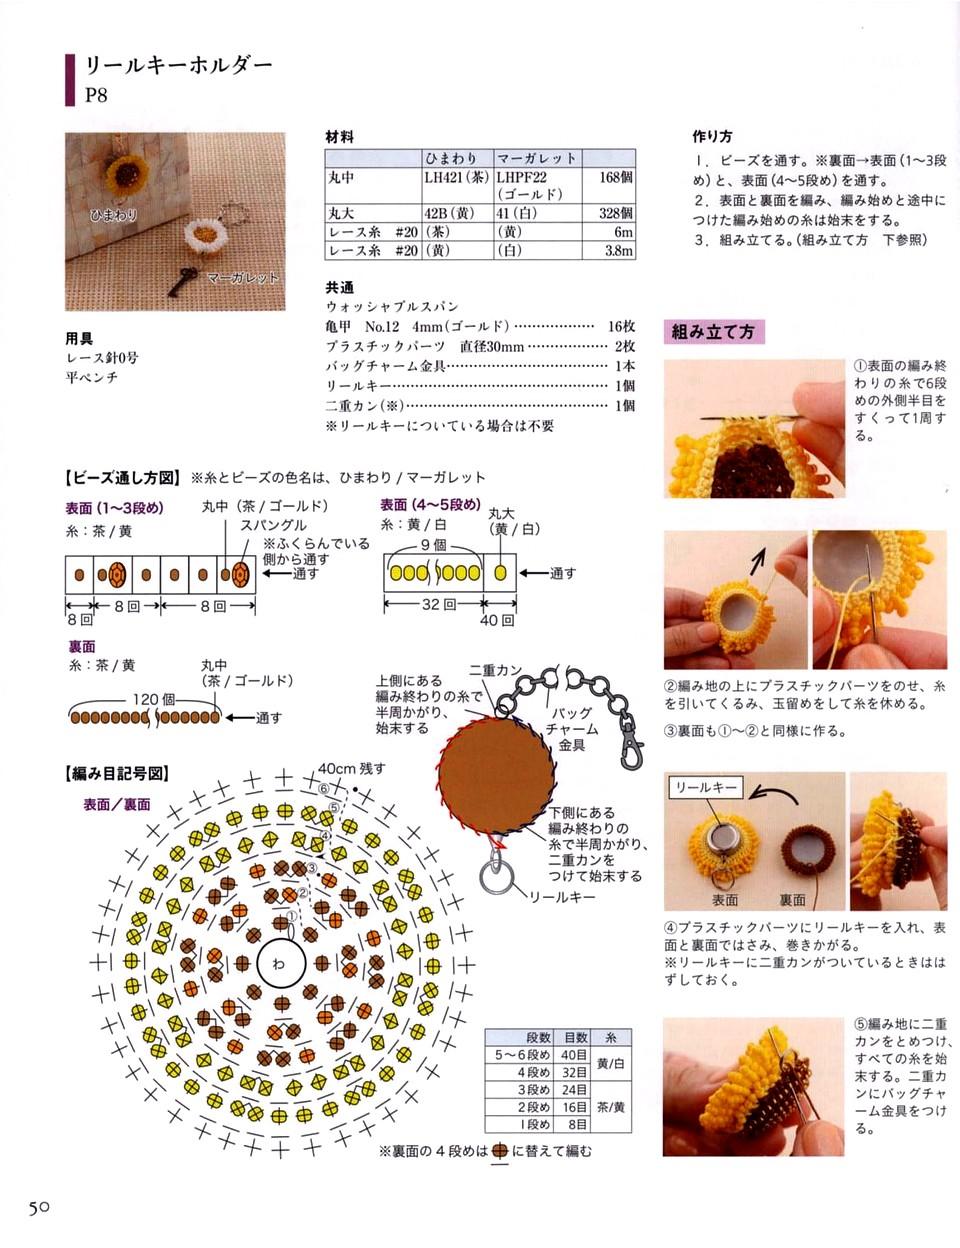 717 Beads Crochet 17-51